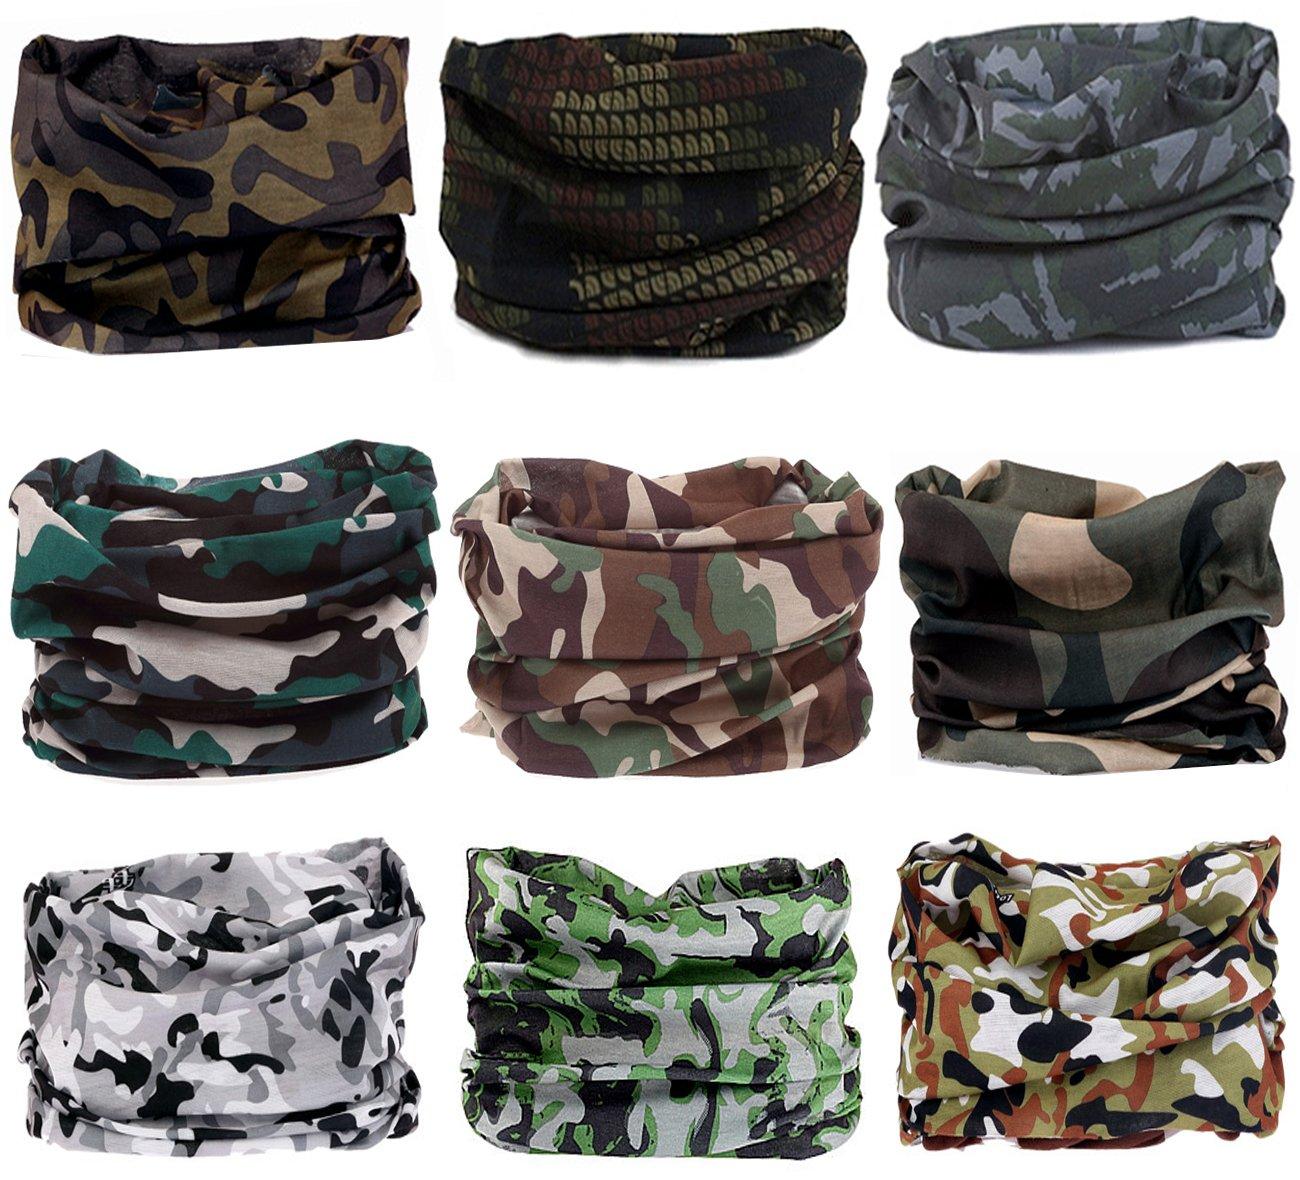 KINGREE 9PCS Headbands, Outdoor Multifunctional Headwear, Sports Magic Scarf, High Elastic Headband with UV Resistance, Athletic Headwrap, Mens Sweatband, Womens Hairband (Camo A1)